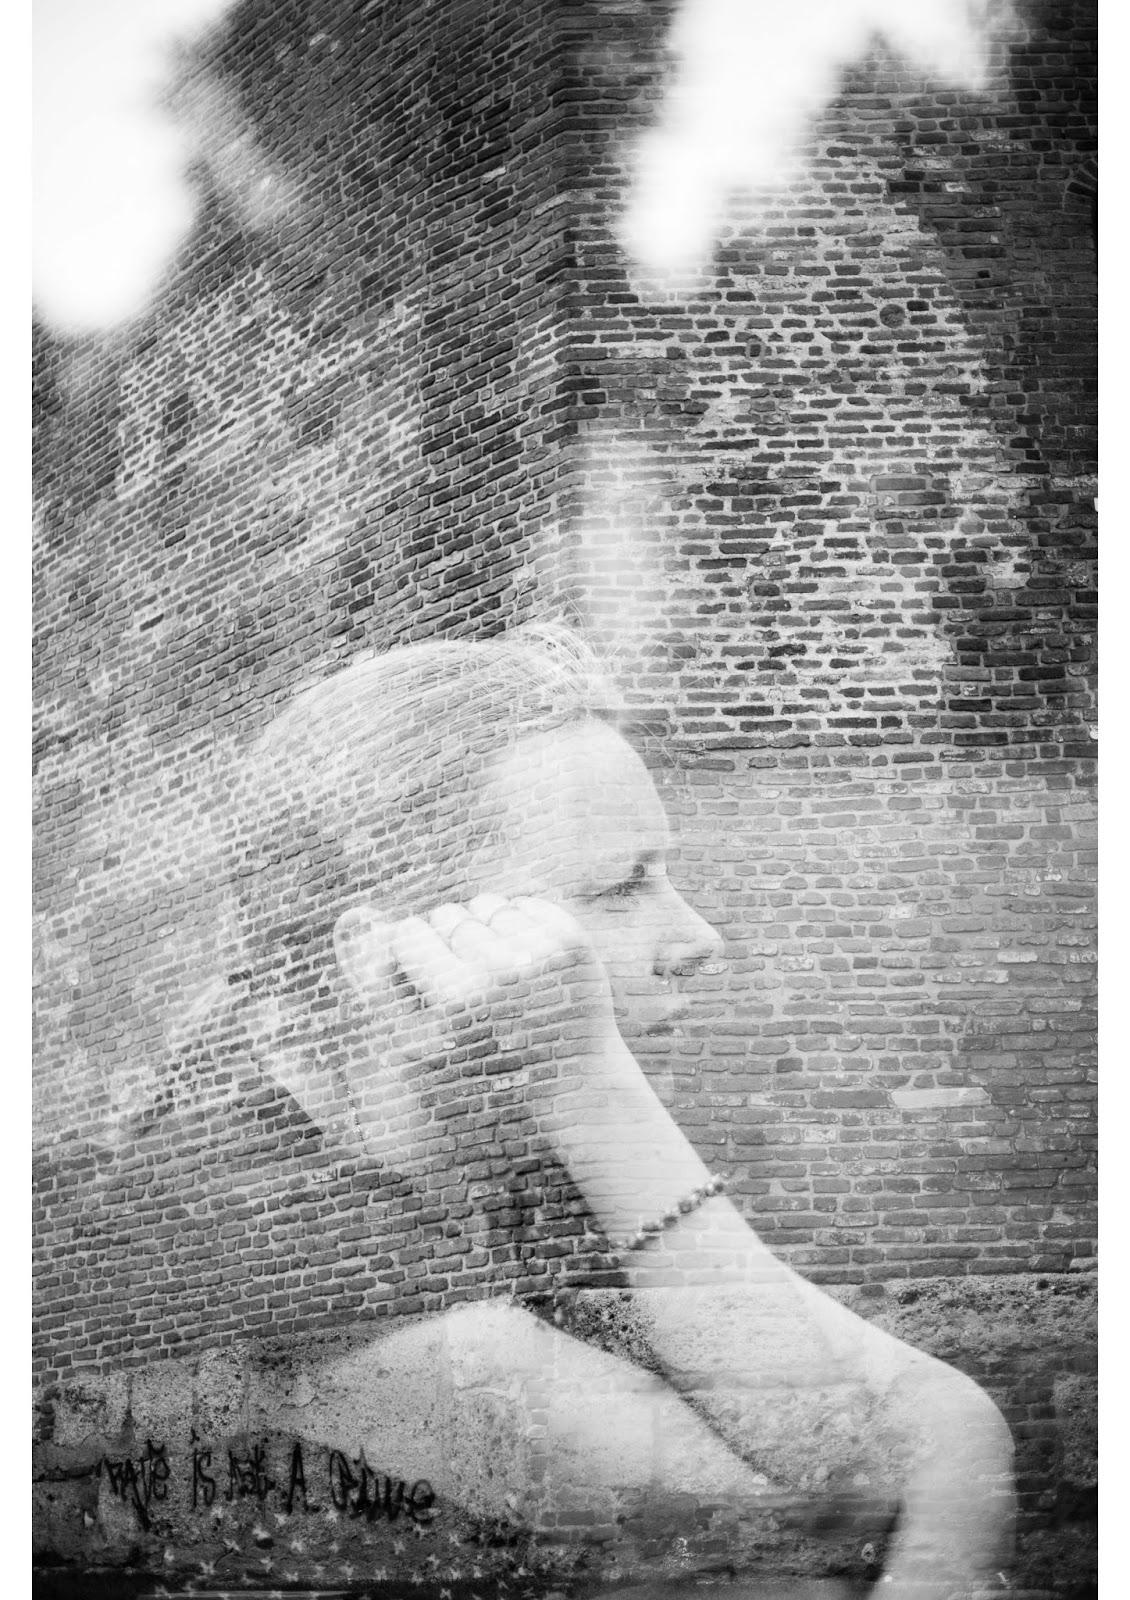 © 2014 Annewil Stroo | www.annewil-stroo.nl